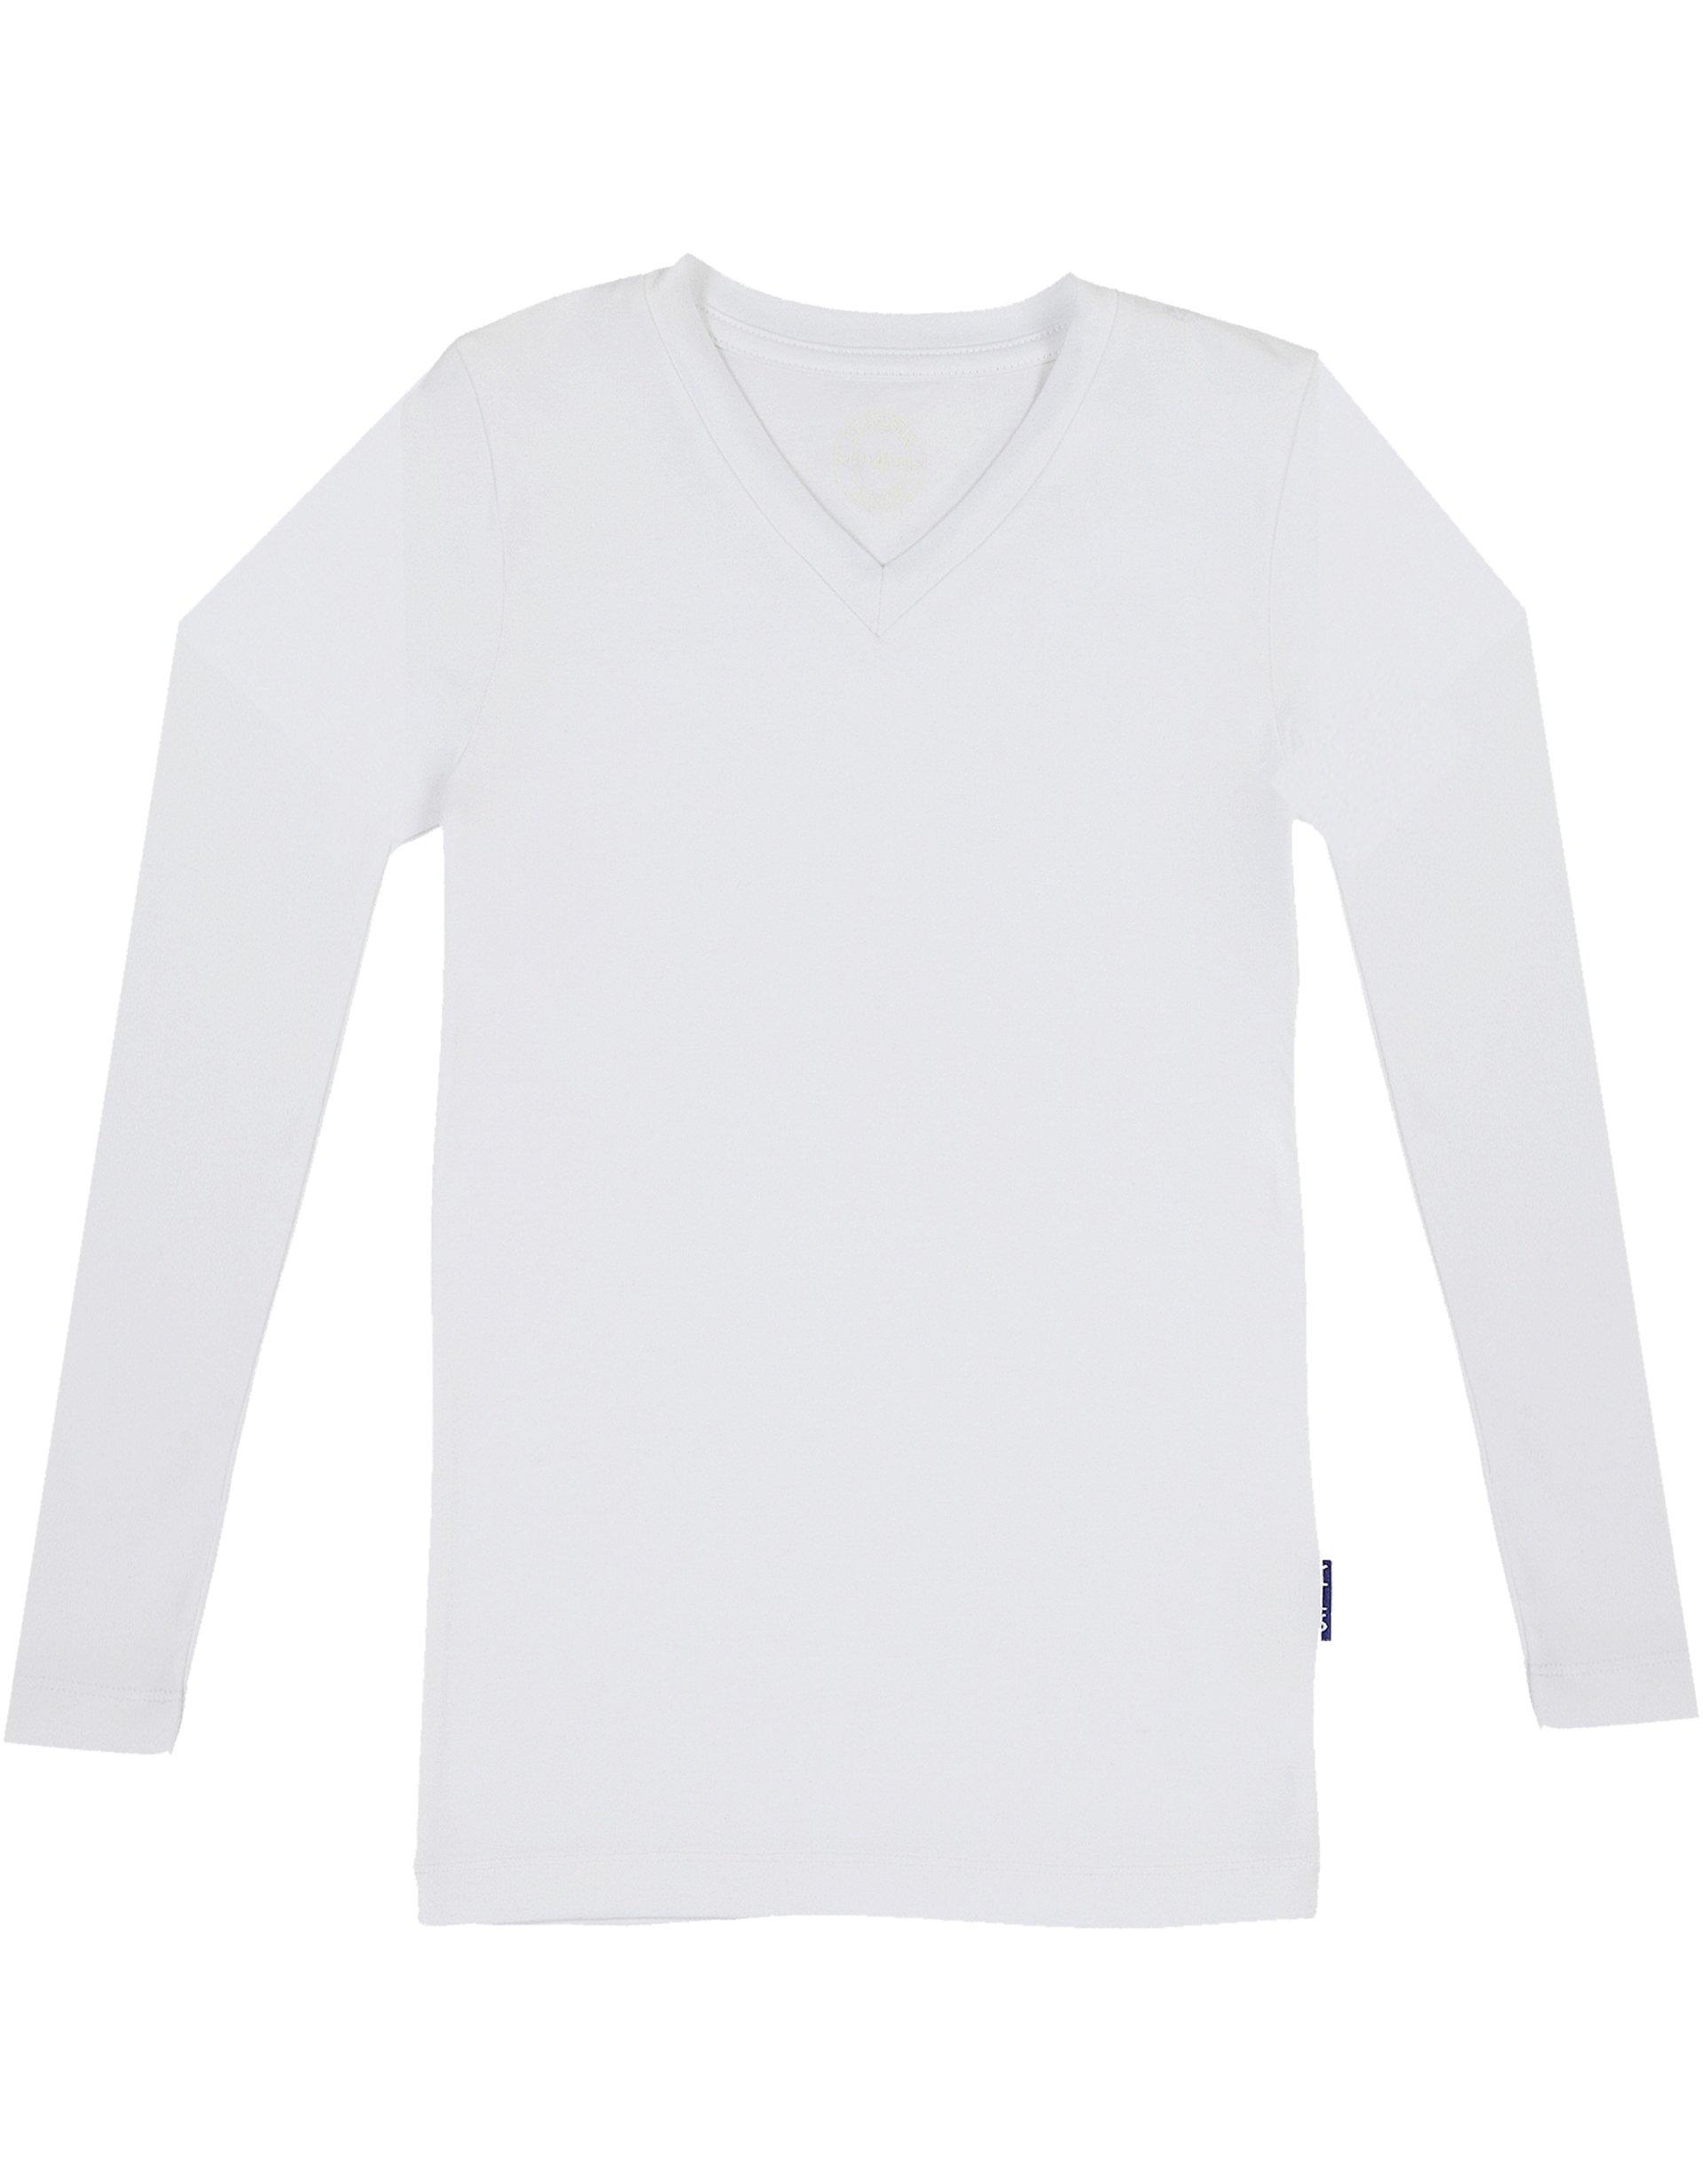 Boys V-neck T-shirt LS